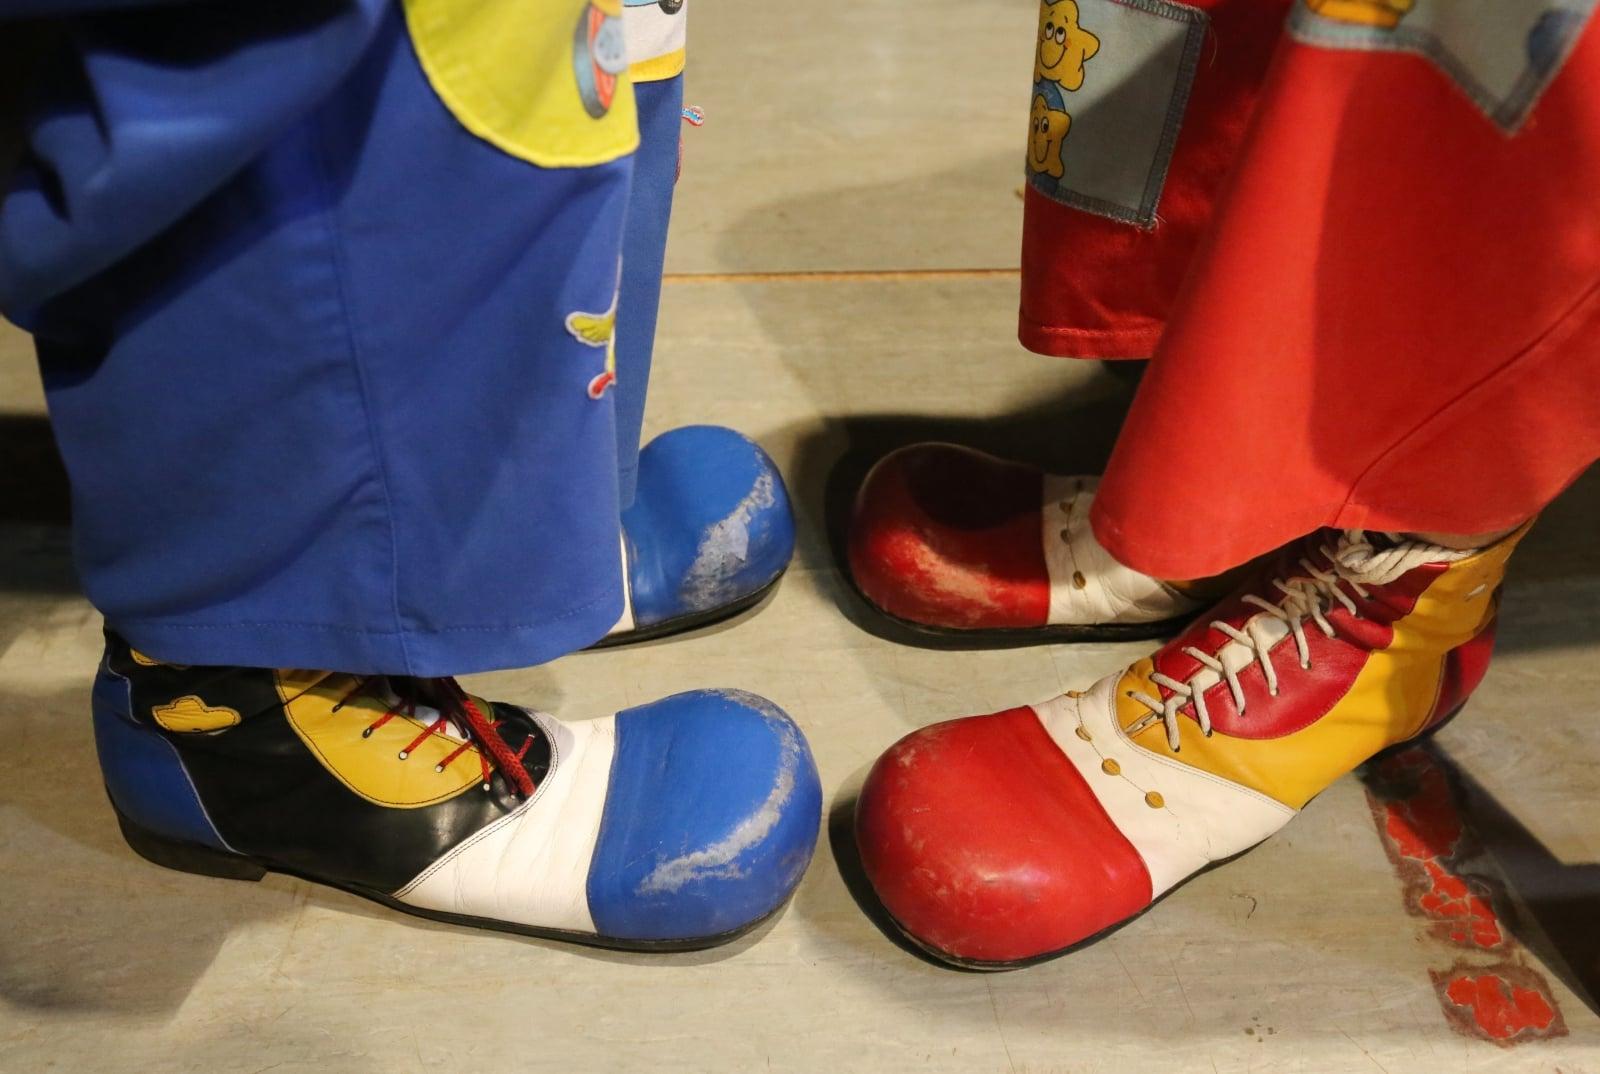 Festiwal klaunów na Białorusi EPA/TATYANA ZENKOVICH